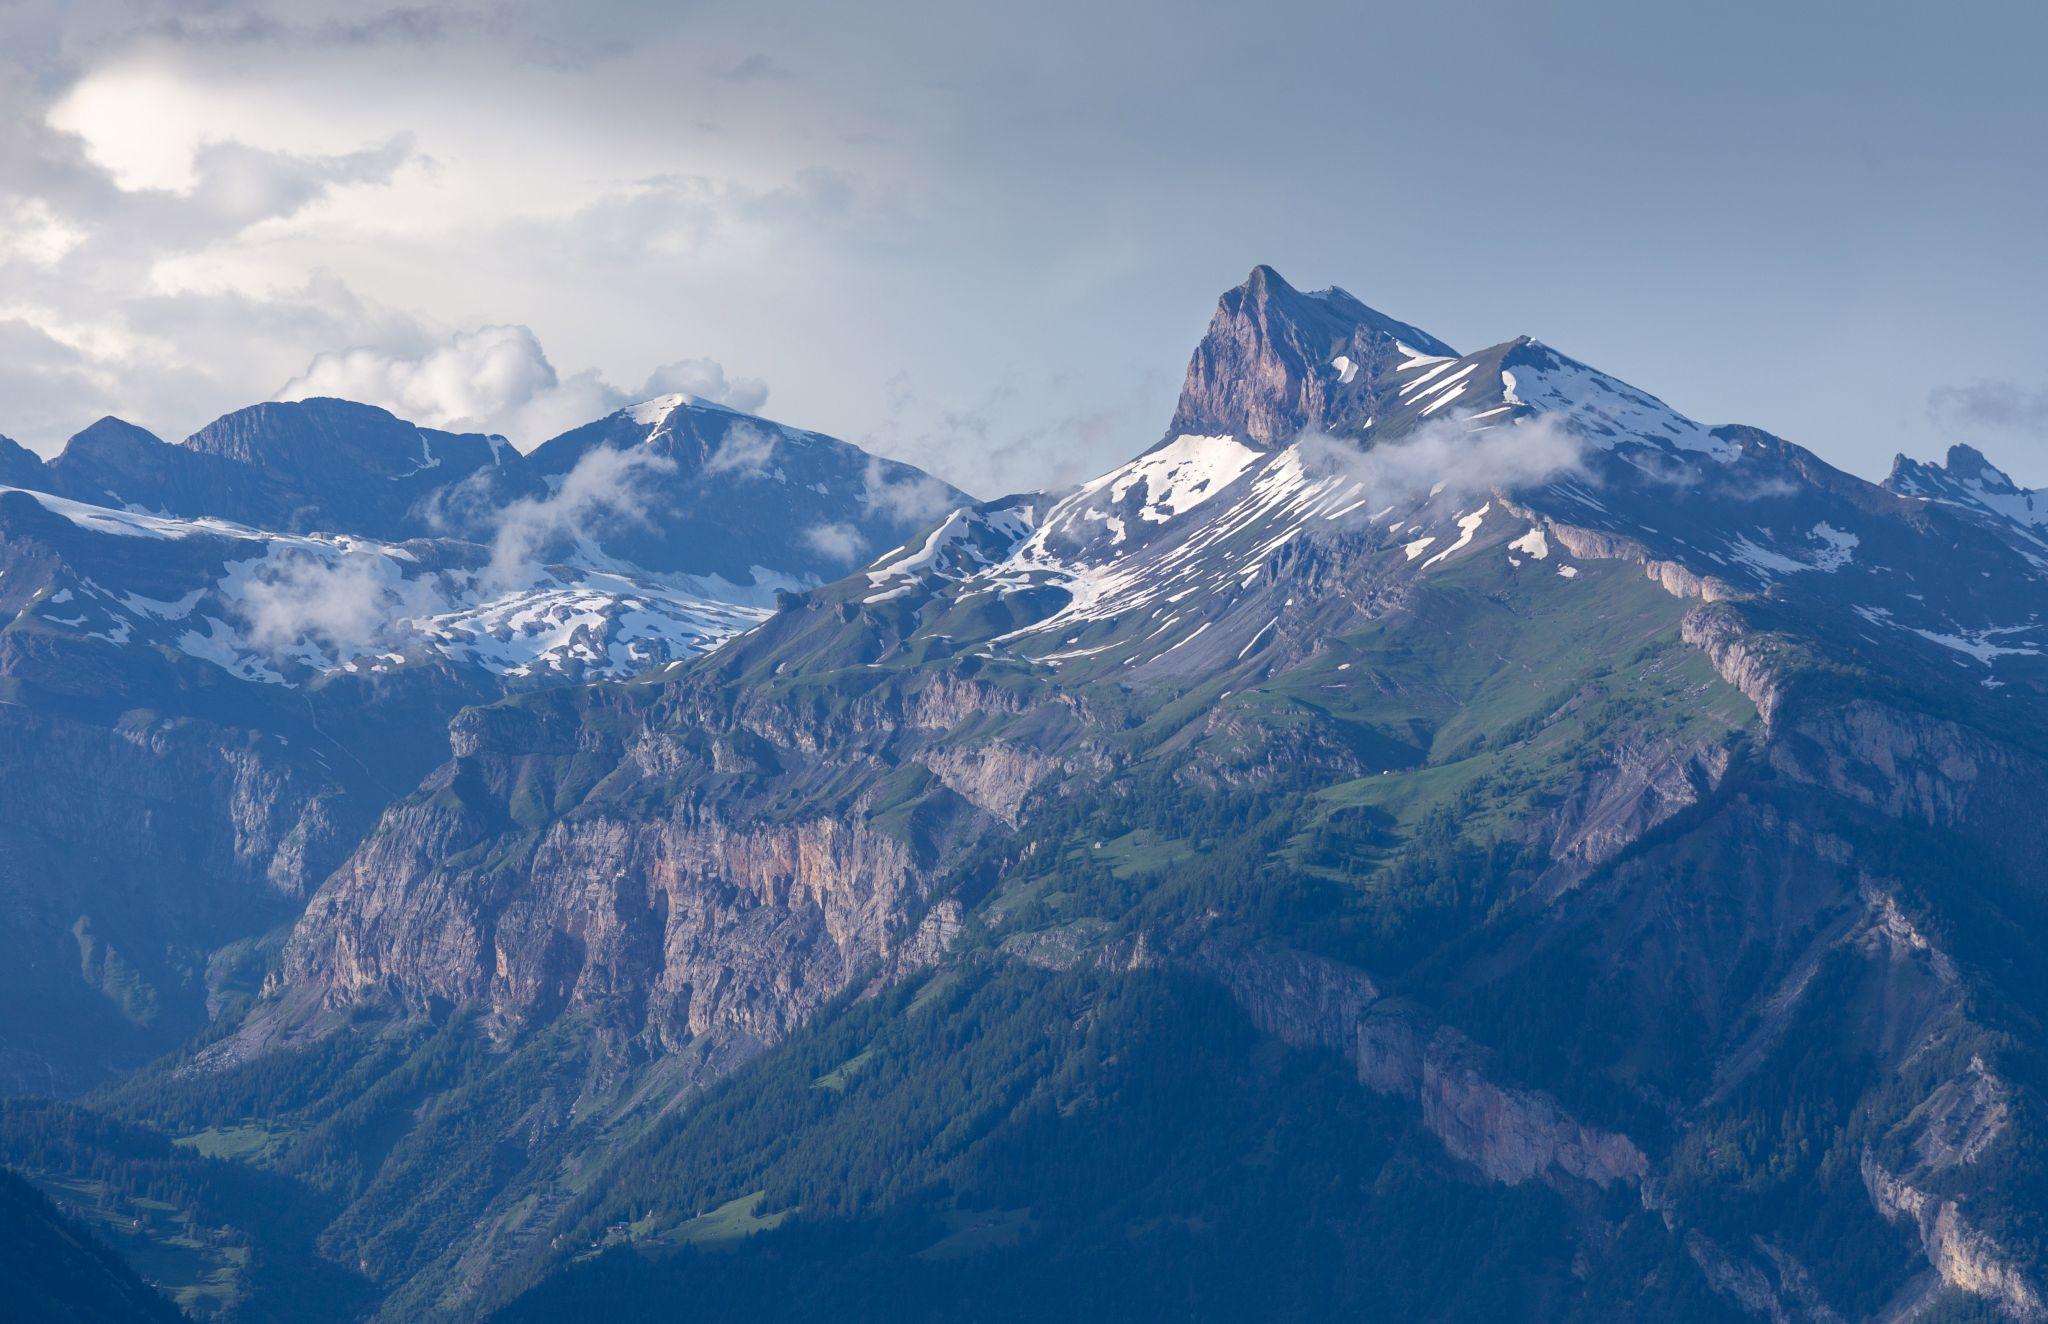 Canton of Valais Alps, Switzerland